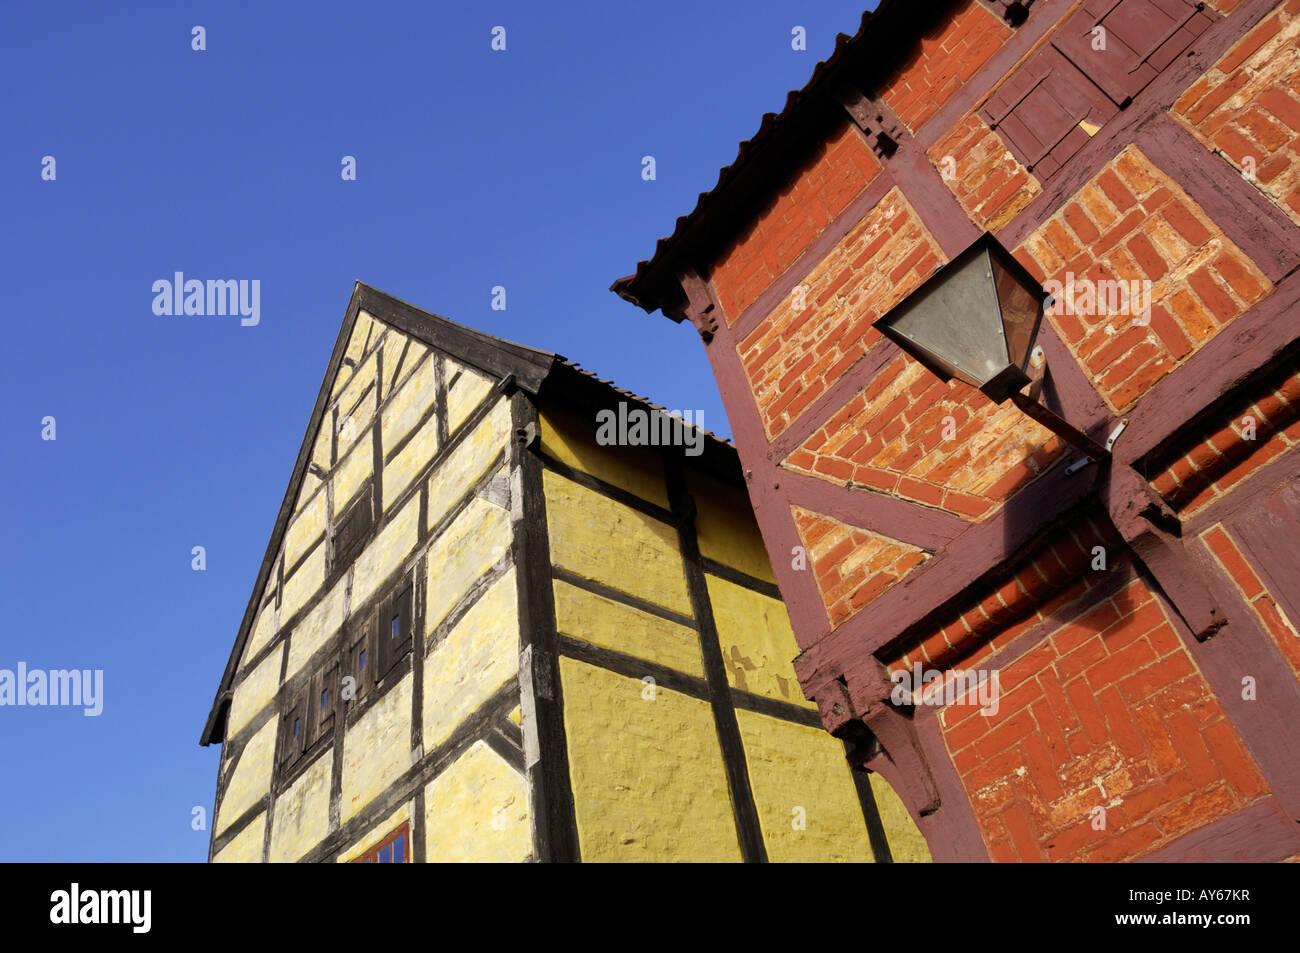 Aalborg Warehouse 1550 1570 Den Gamle By Aarhus Denmark - Stock Image